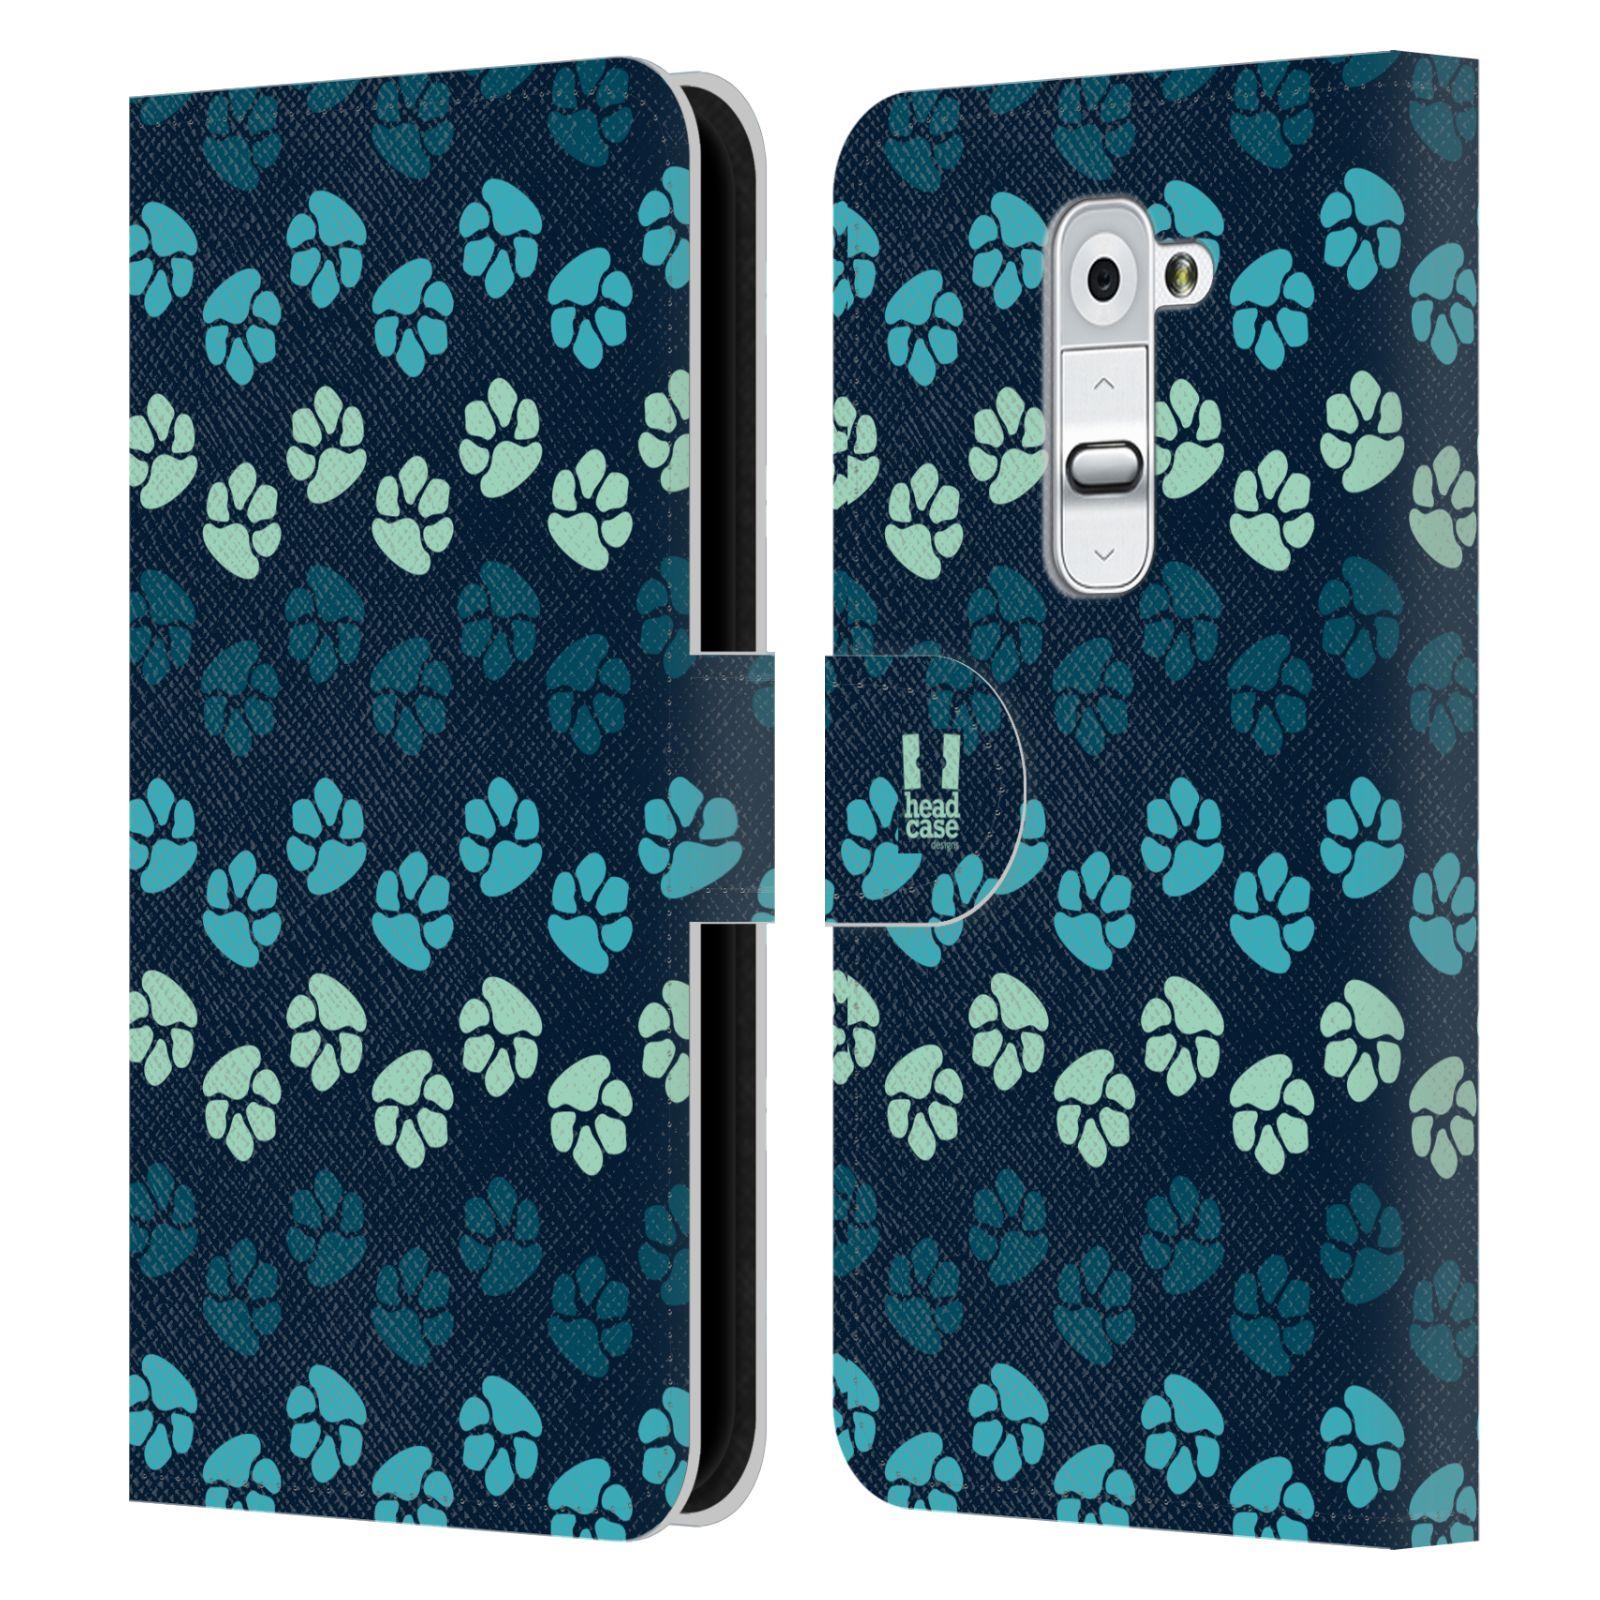 HEAD CASE Flipové pouzdro pro mobil LG G2 (D802) Pejsek ťapky modrá barva